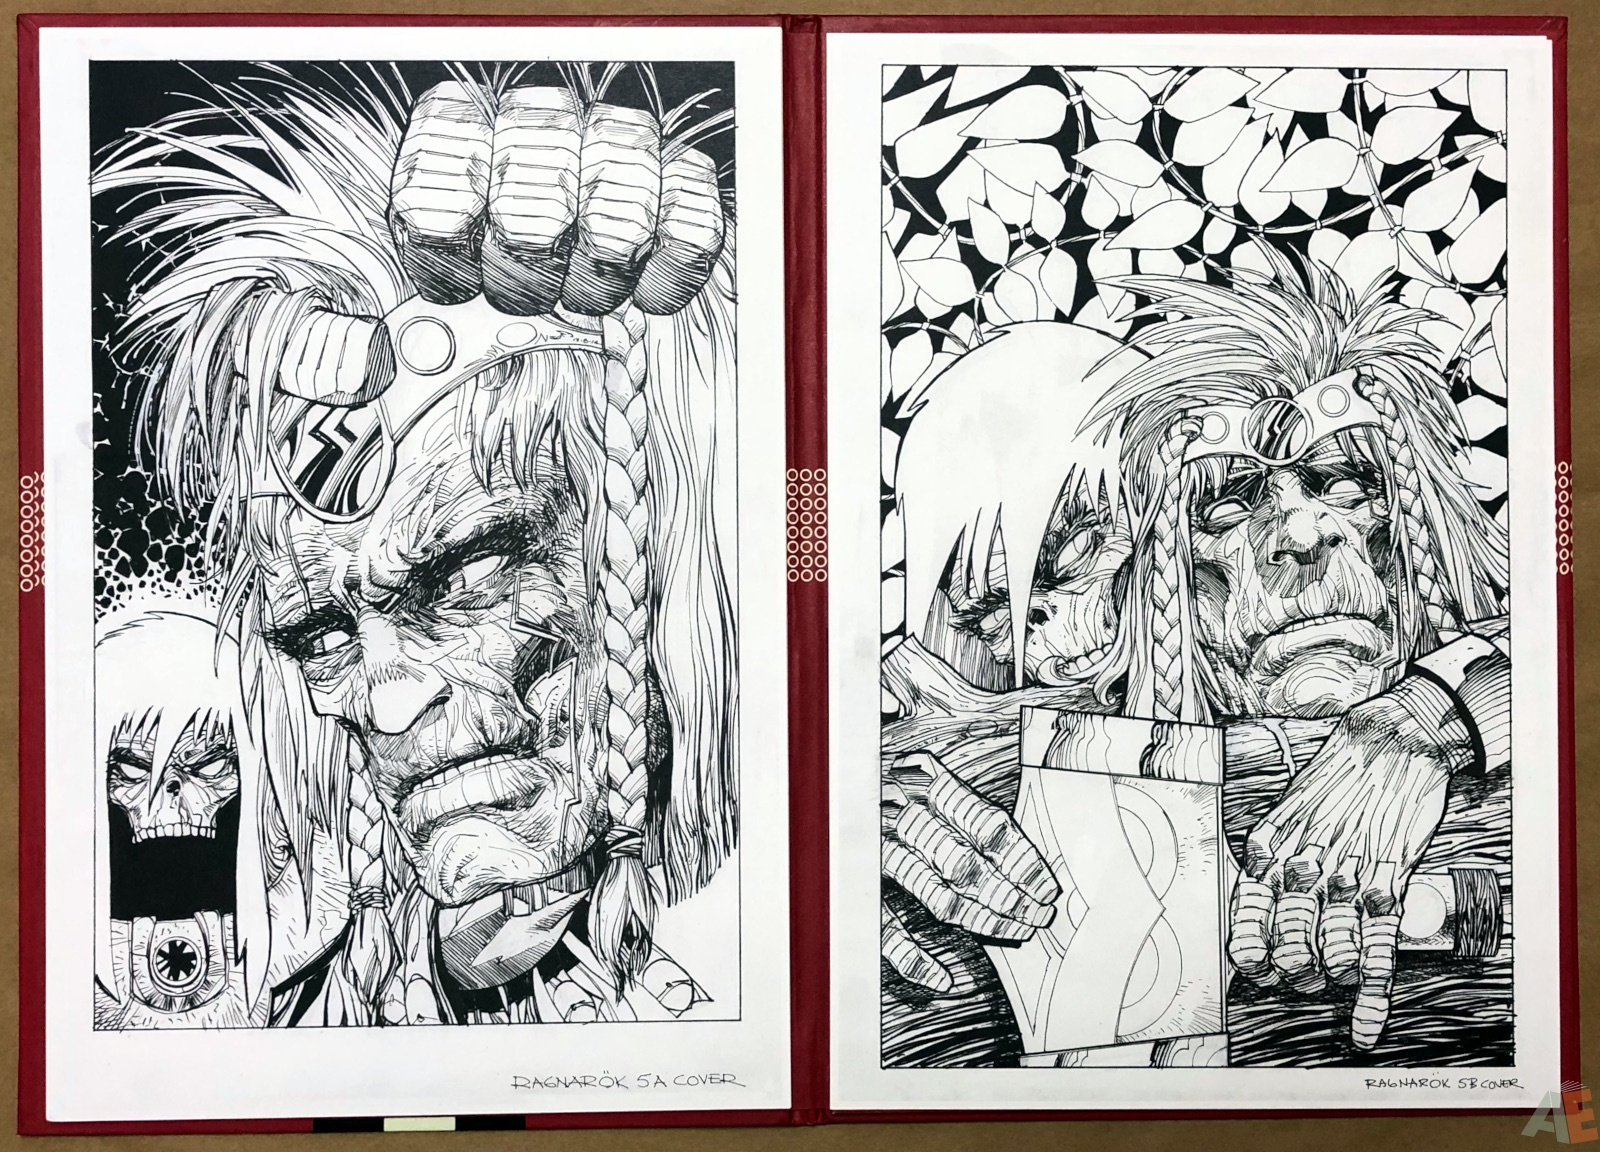 Walter Simonson's Ragnarök Artist's Edition Portfolio 14